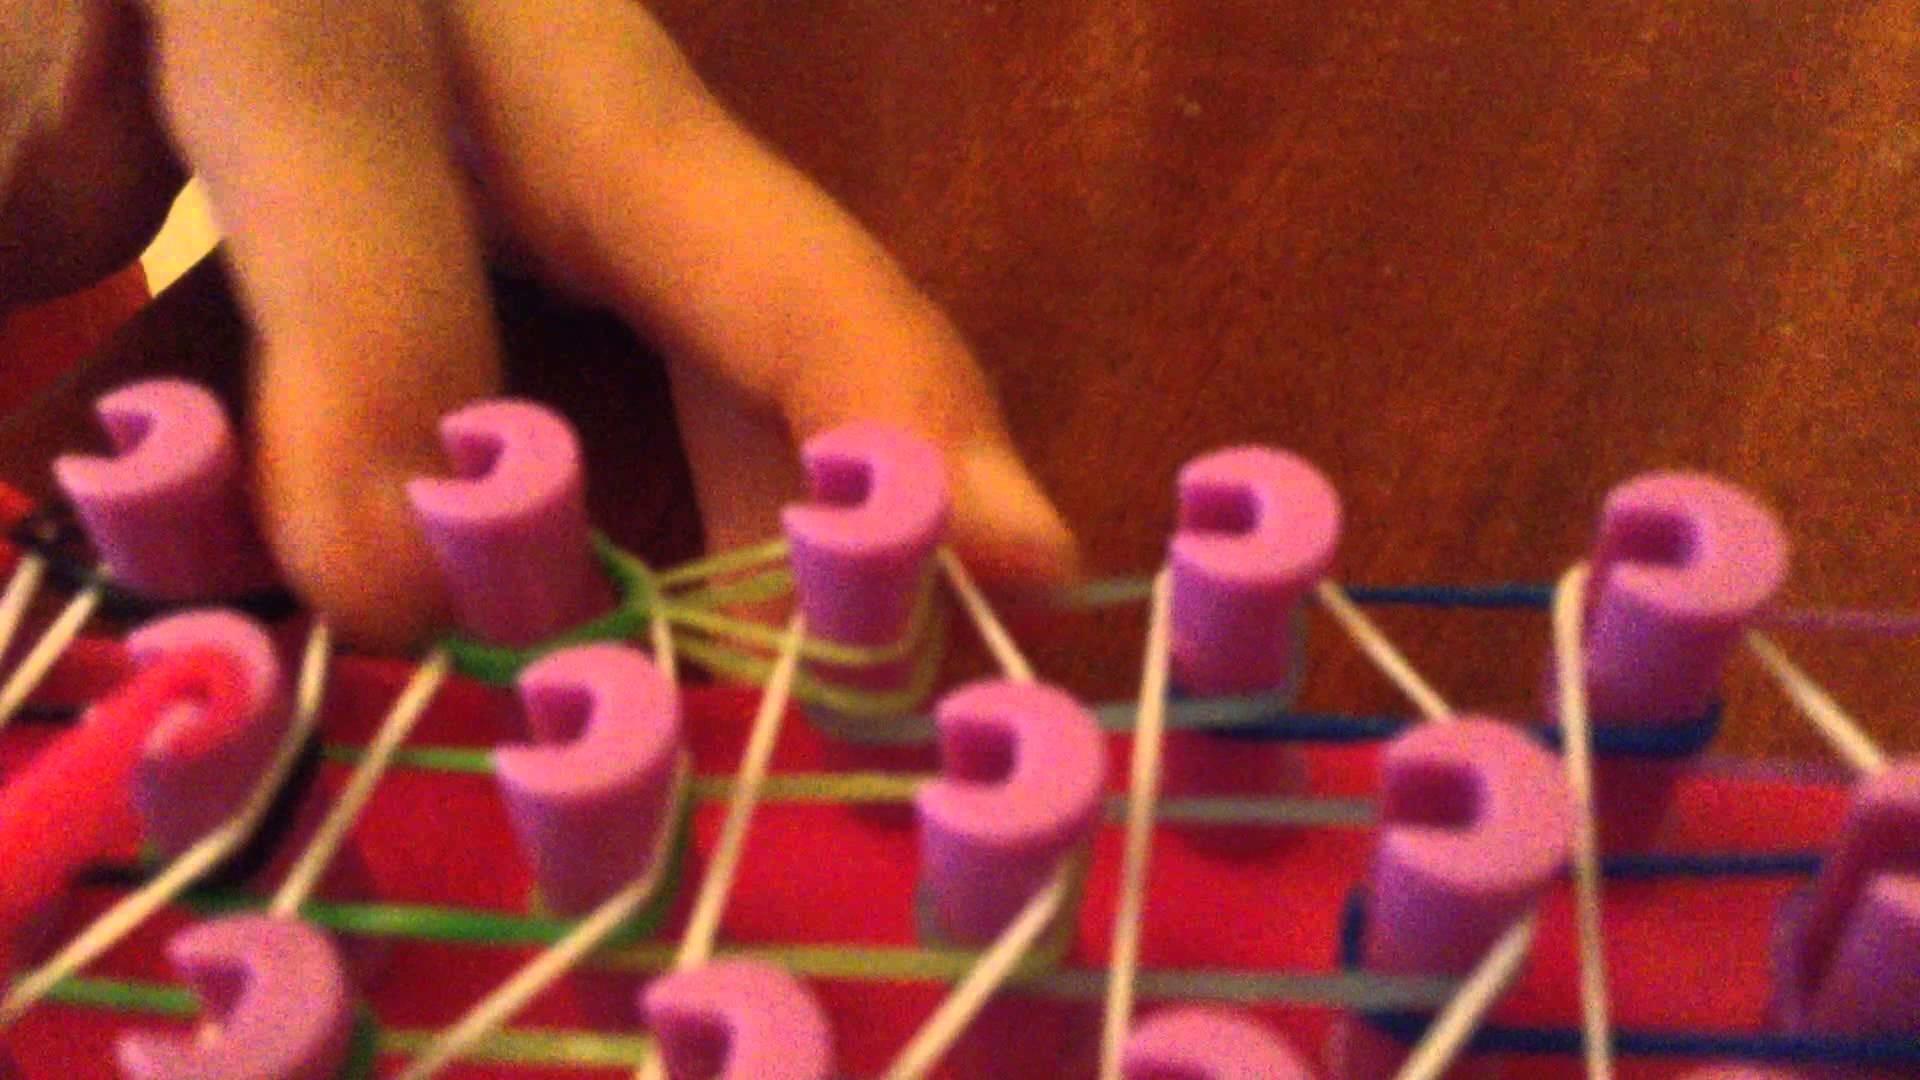 Rainbow loom italiano tutorial #001